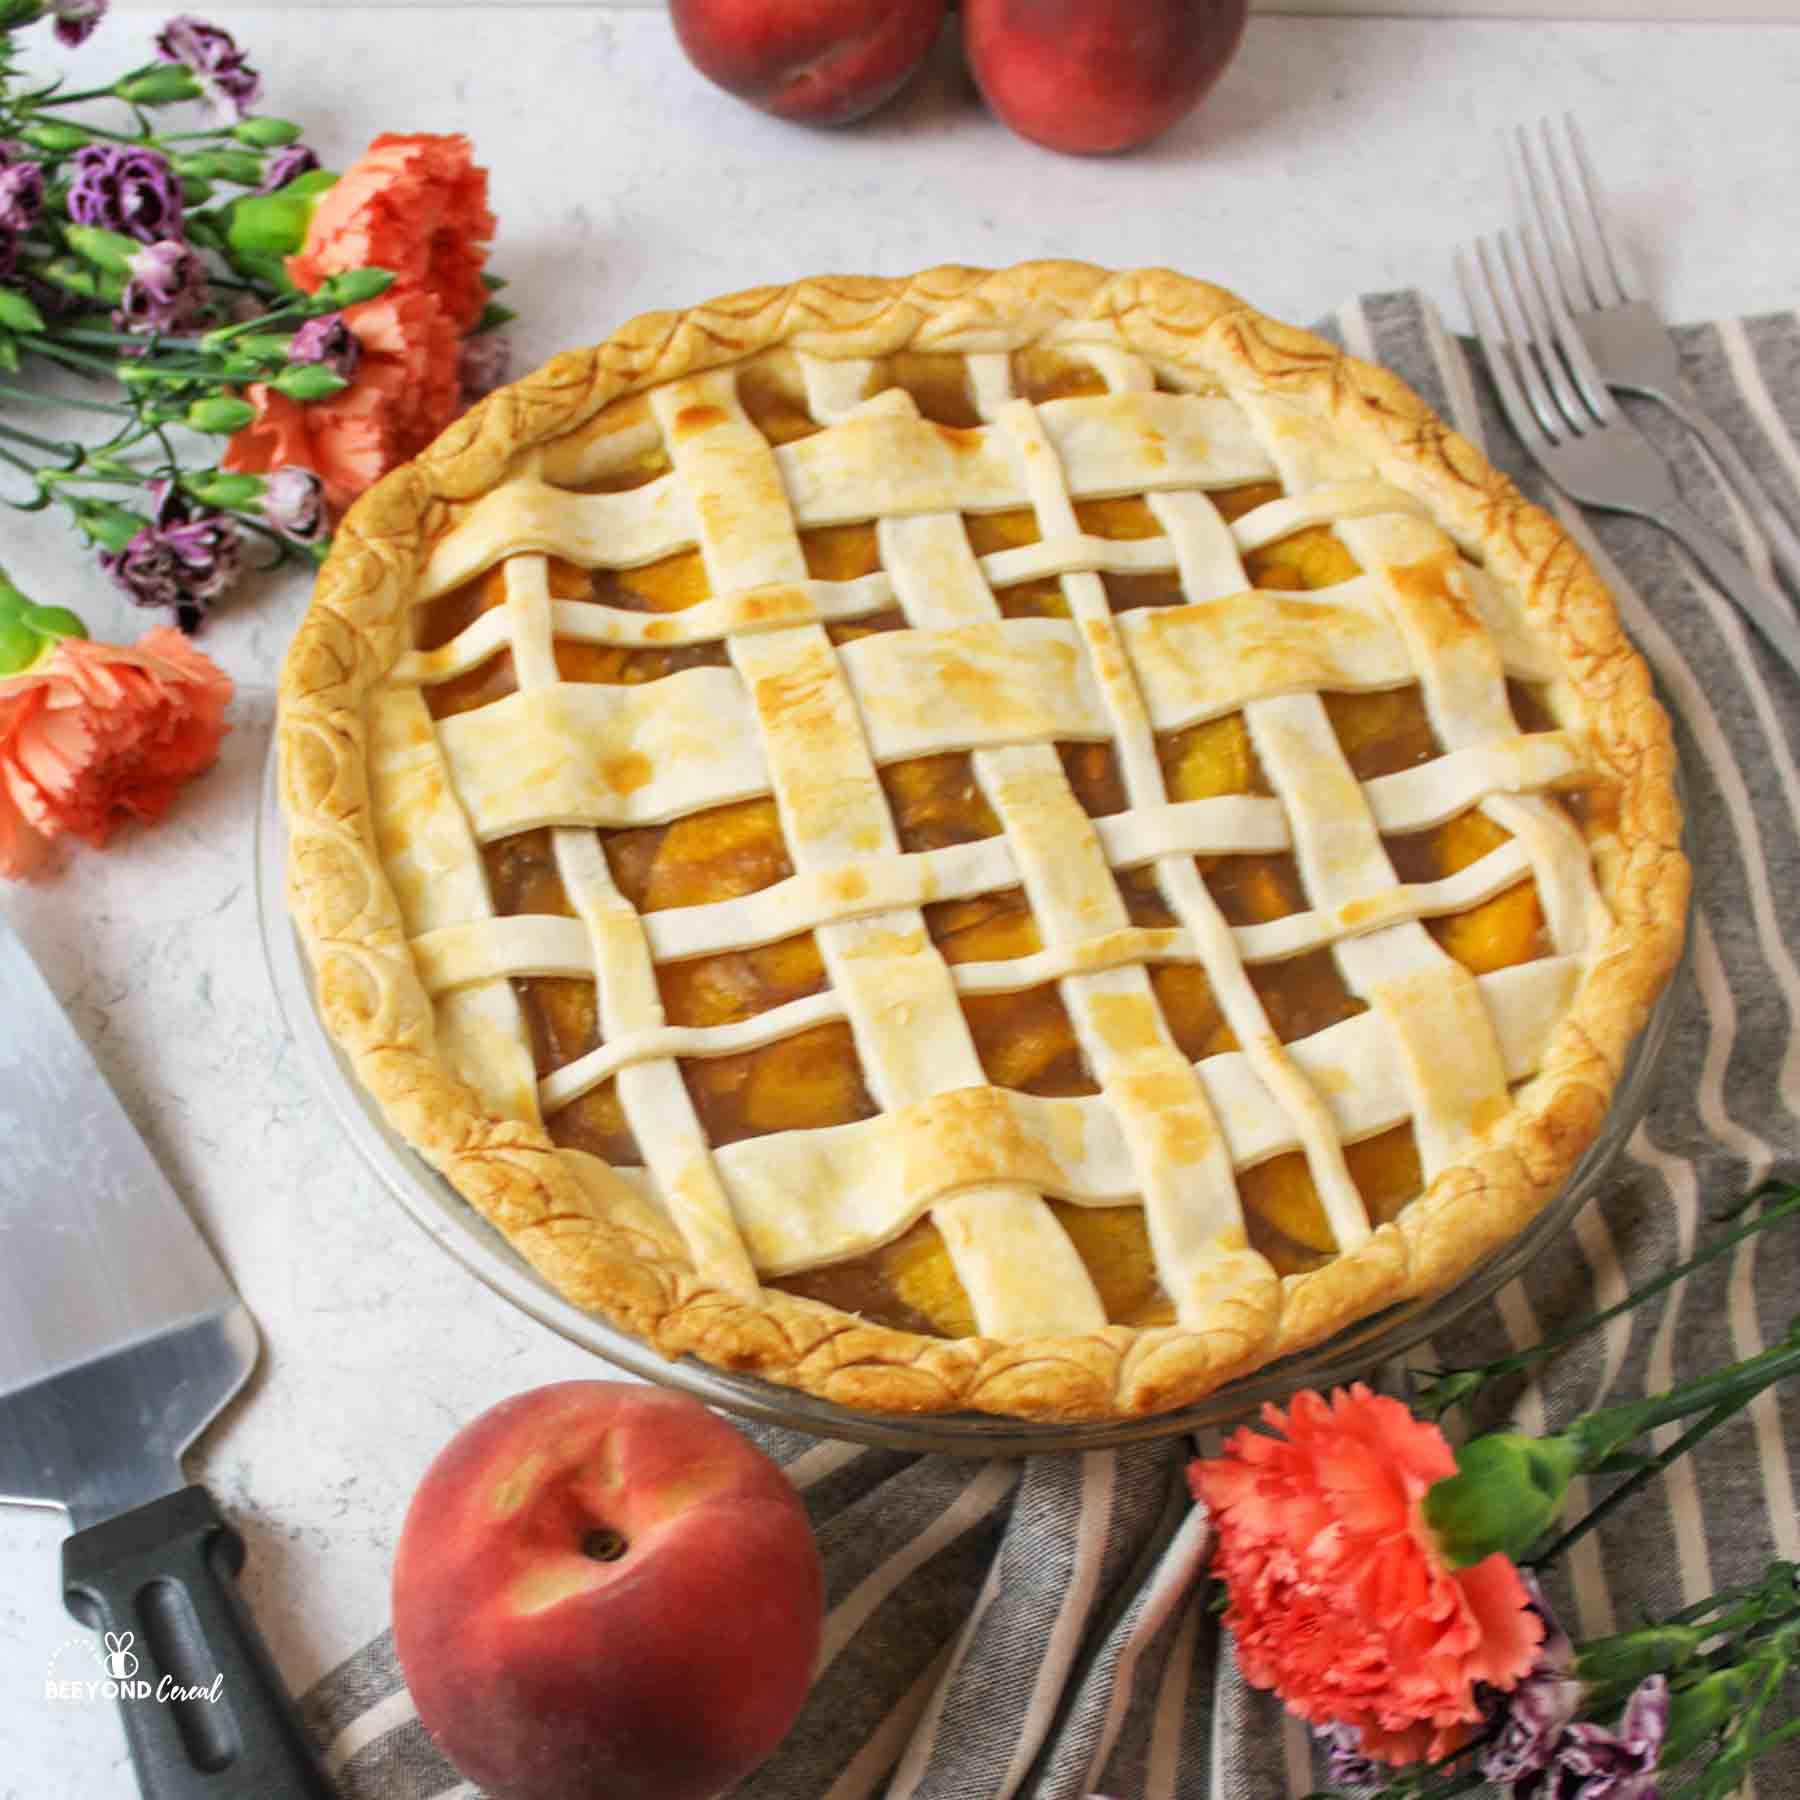 a close up of a fresh baked peach pie